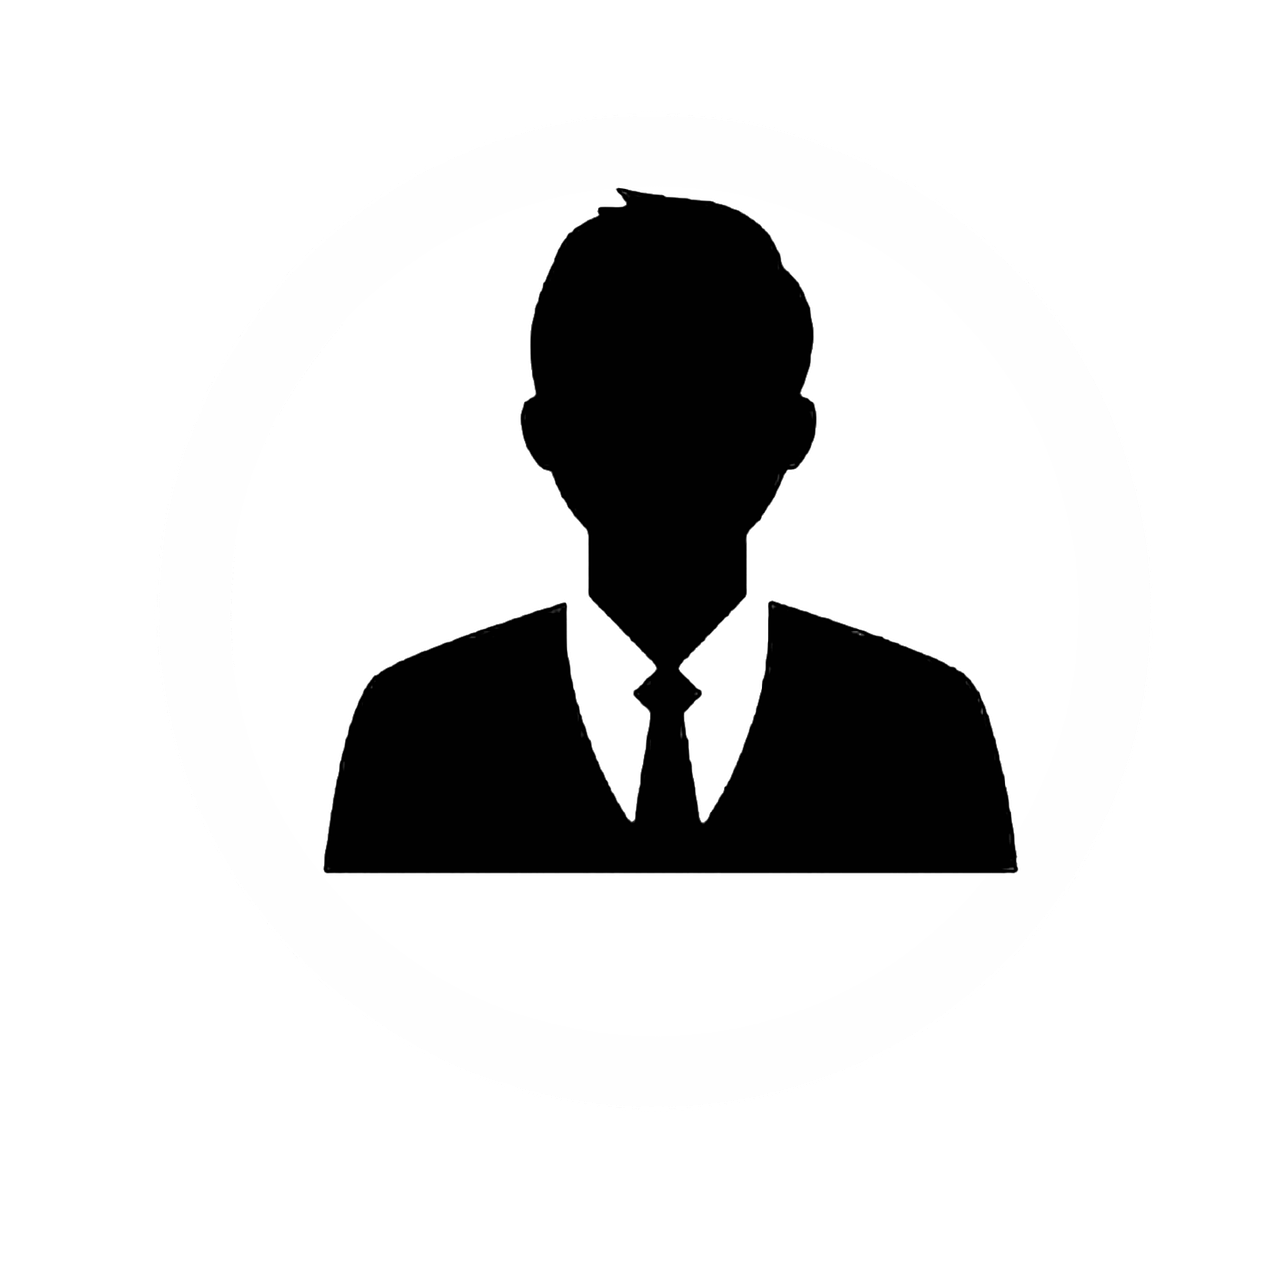 people, silhouette, avatar